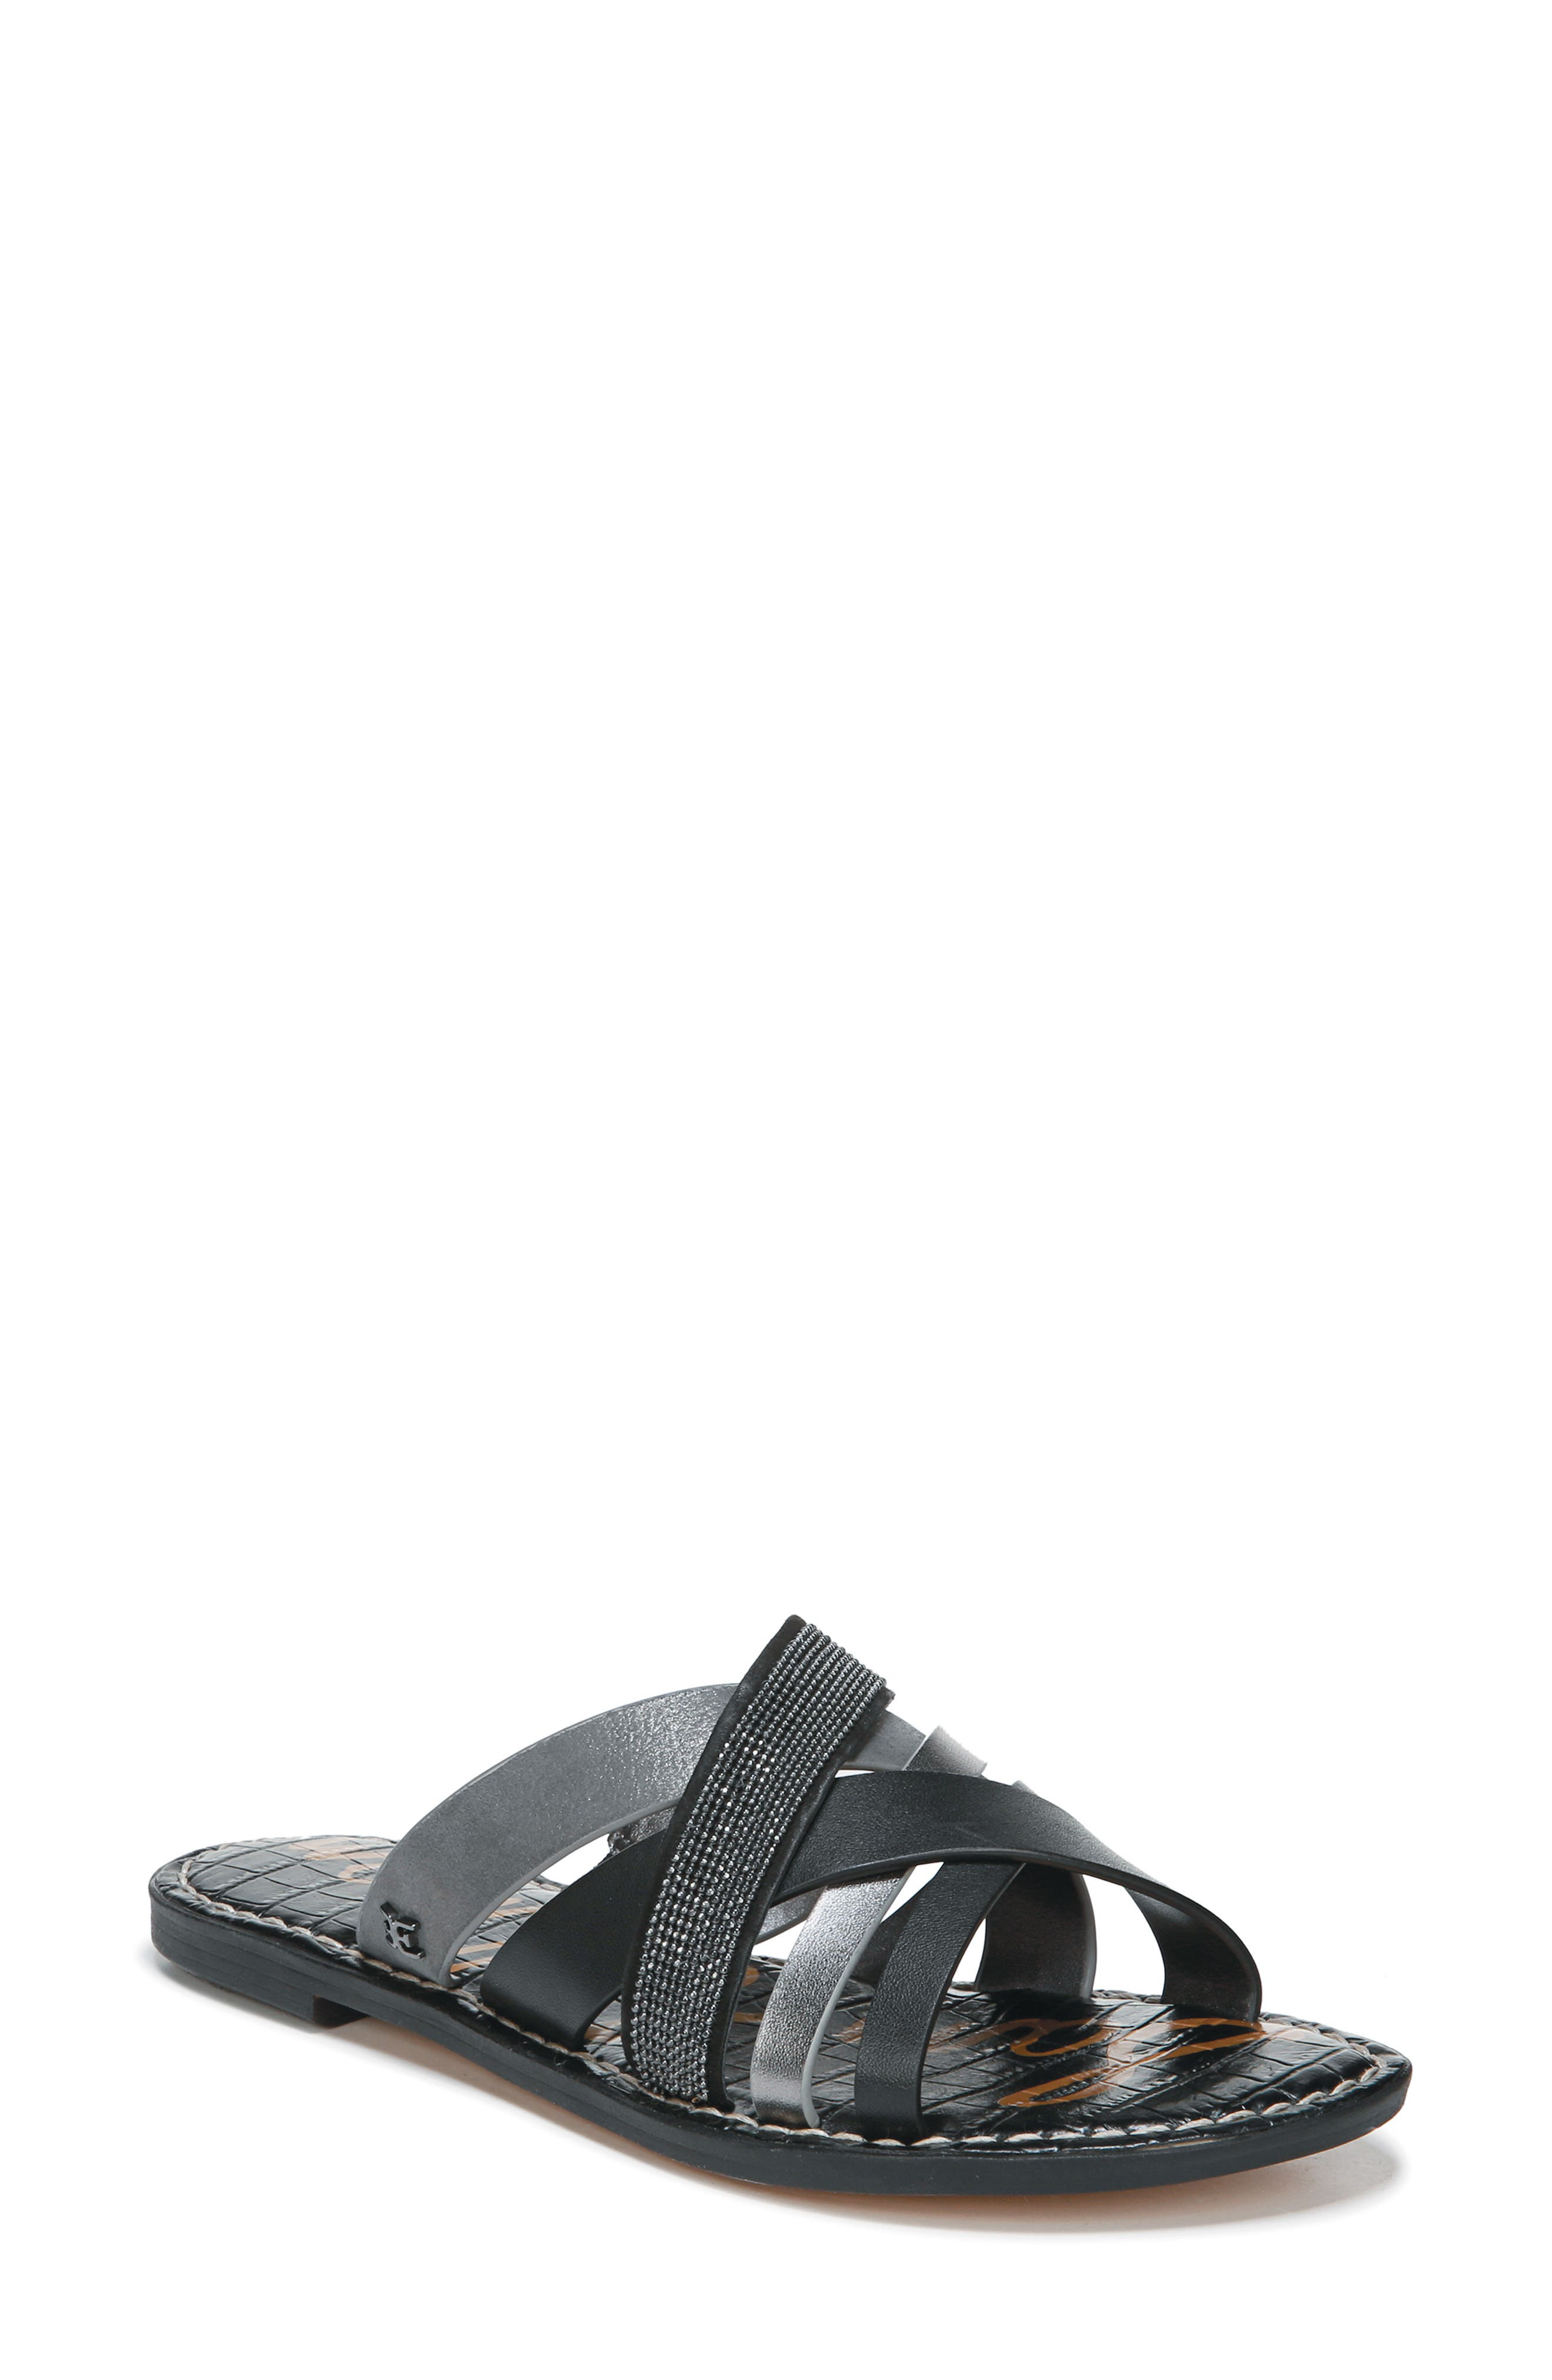 Glennia Slide Sandal, Main, color, DARK PEWTER/ BLACK LEATHER